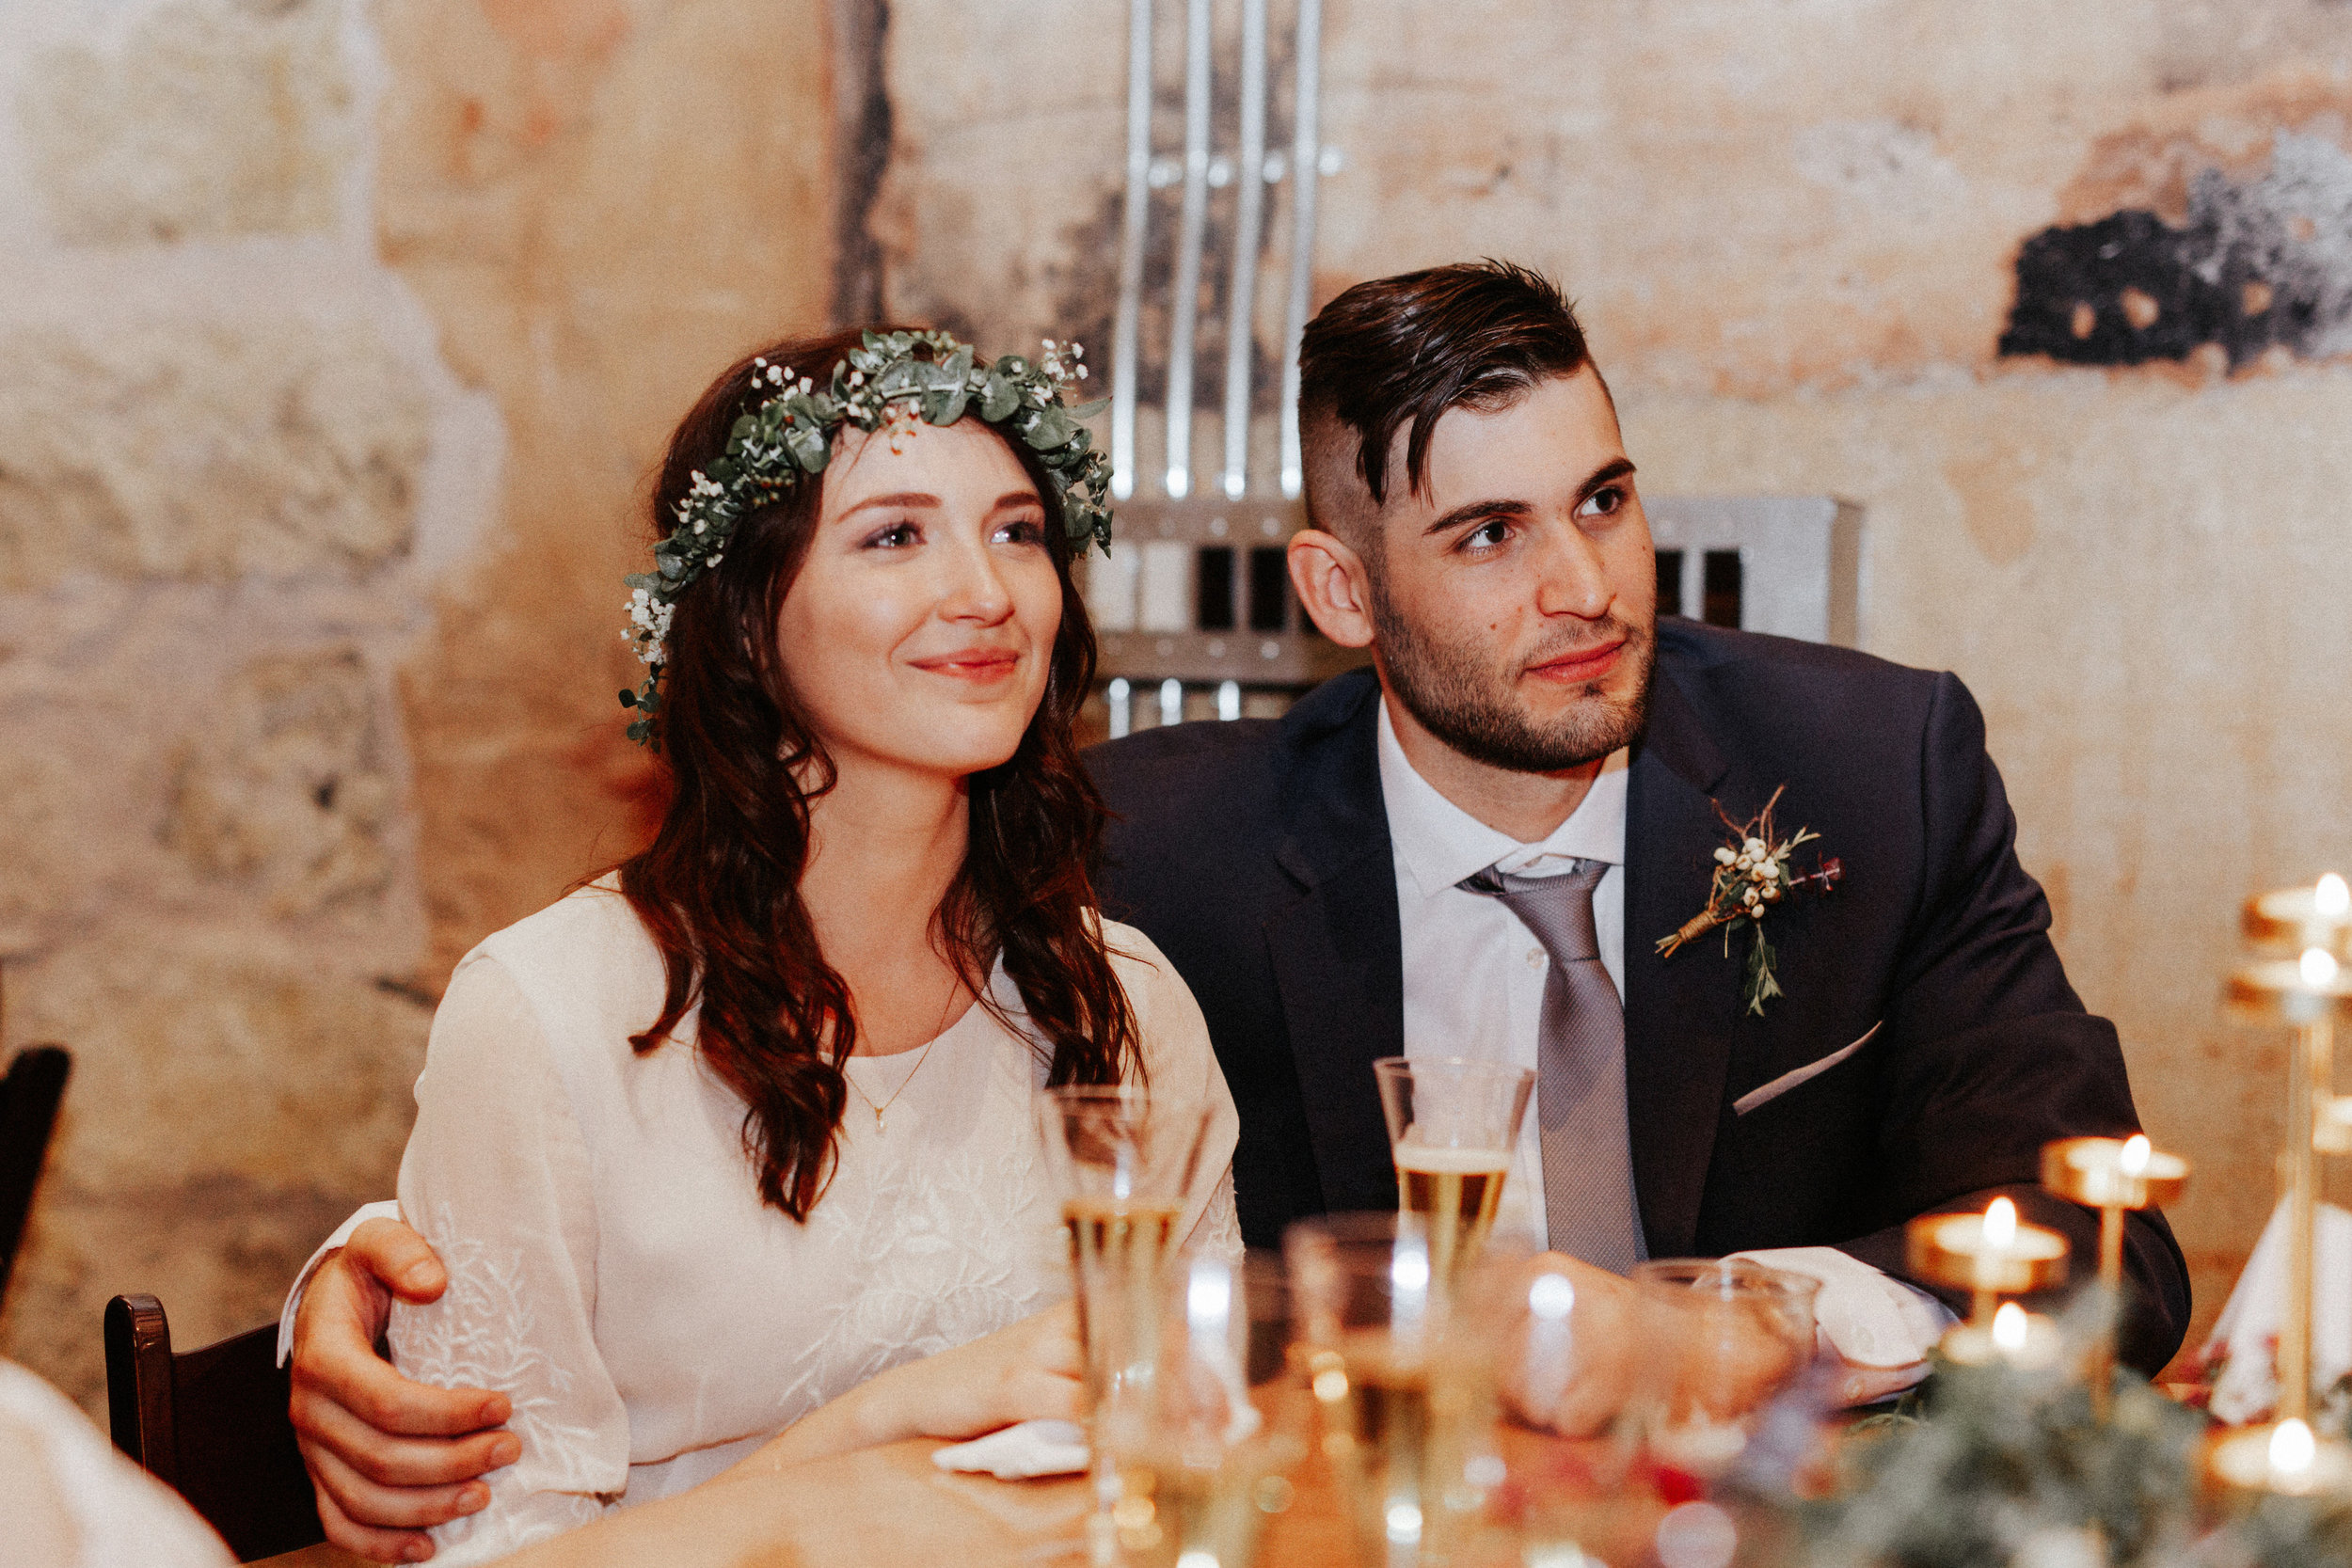 austin-wedding-photographer-60.jpg